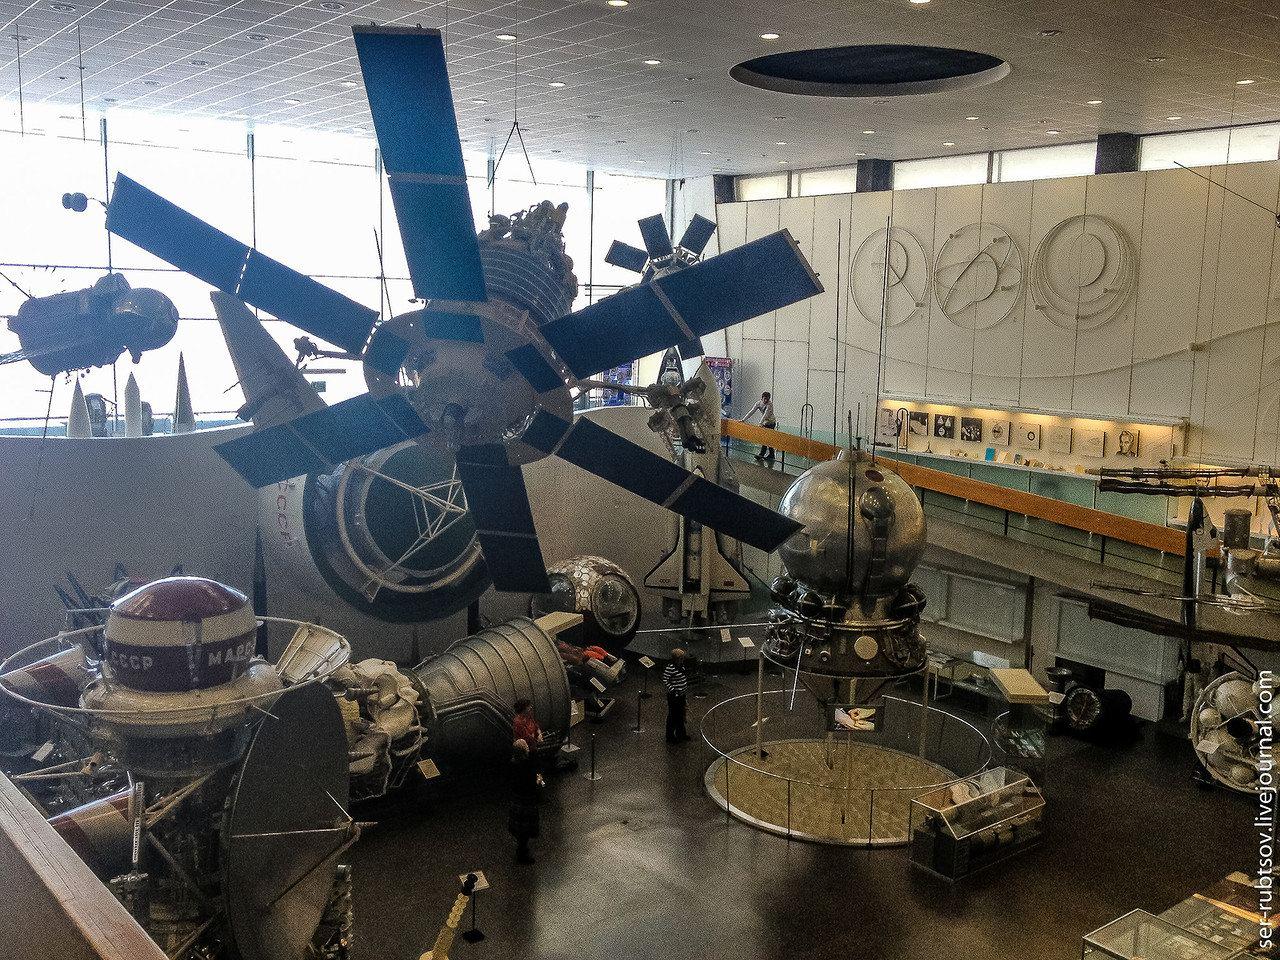 Kaluga - the cradle of astronautics